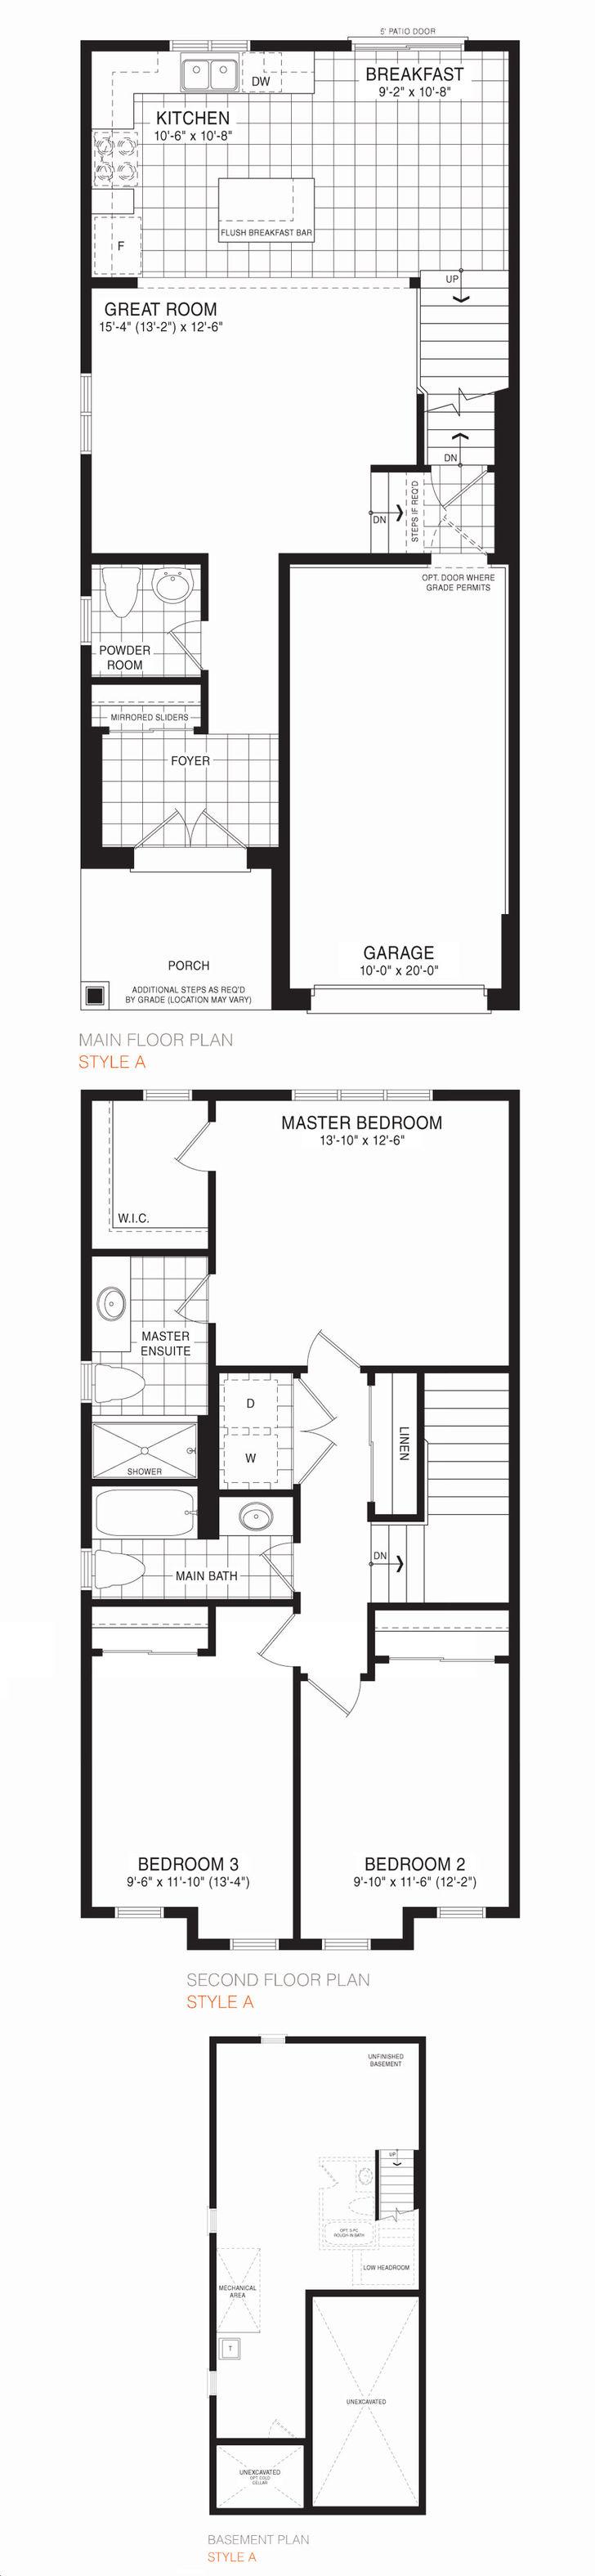 Empire Avalon By Empire Sunridge Floorplan 3 Bed 2 5 Bath